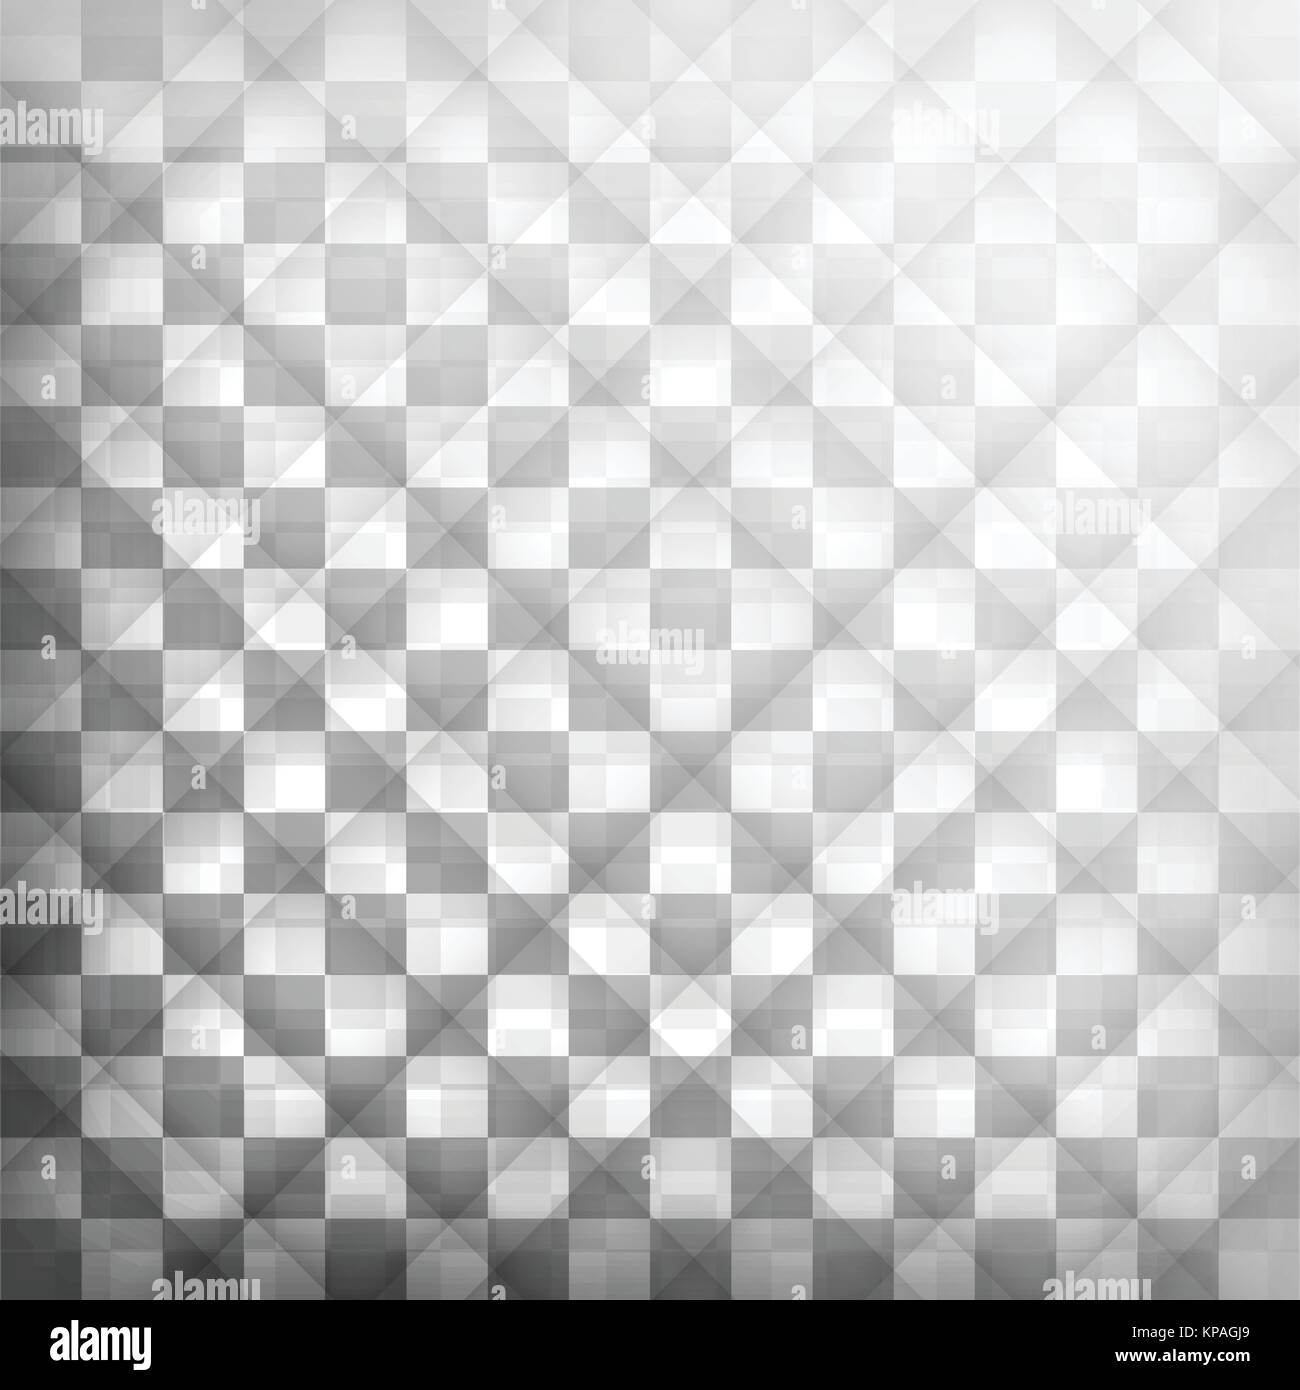 Box black and white background, illustration vector - Stock Image